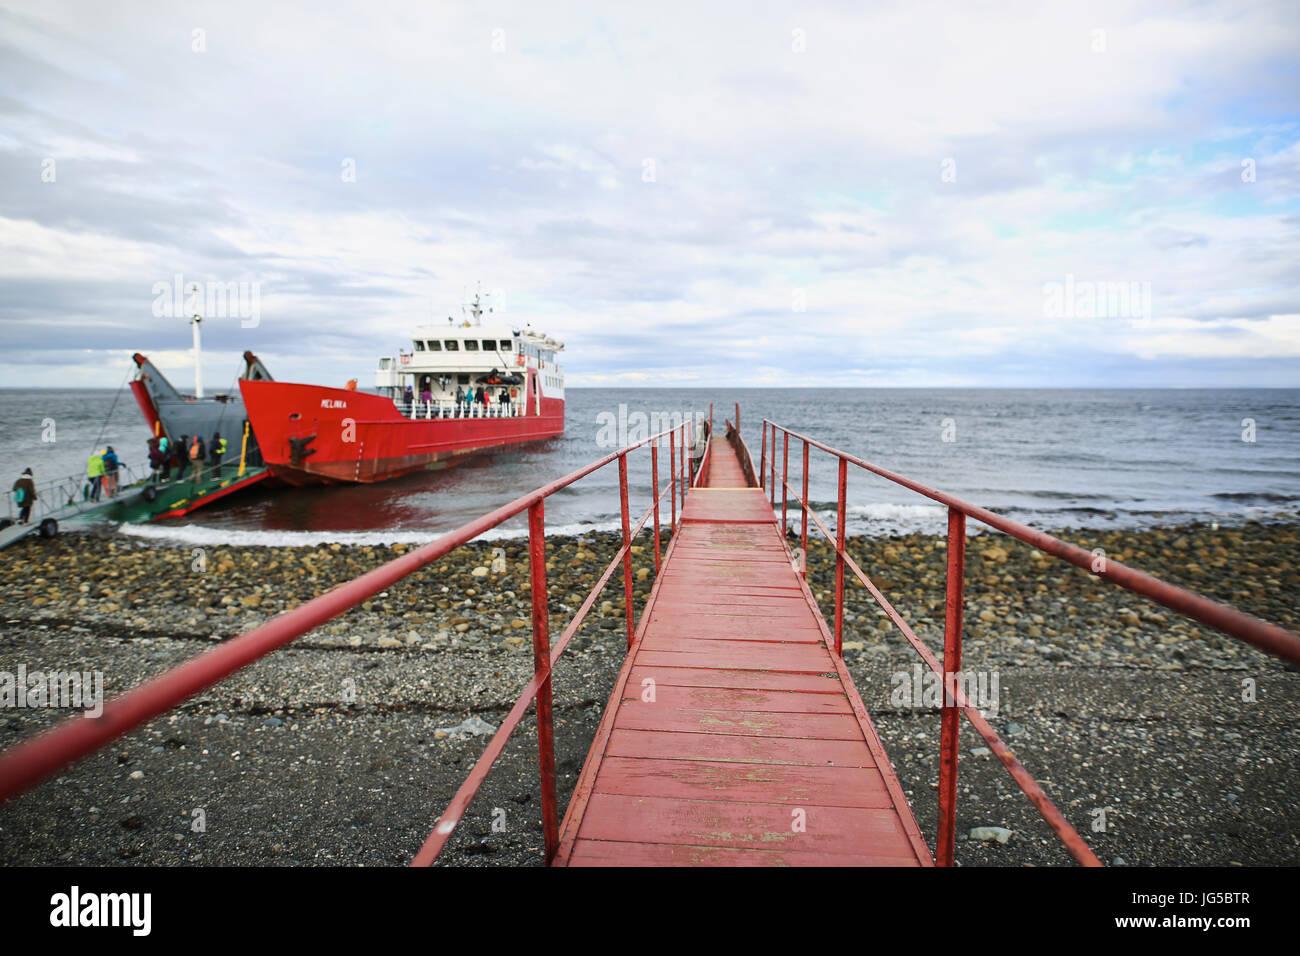 500px Photo ID: 190522811 - Isla Magdalena, Patagonia, Chile ©2016 Davide Marzotto - Stock Image